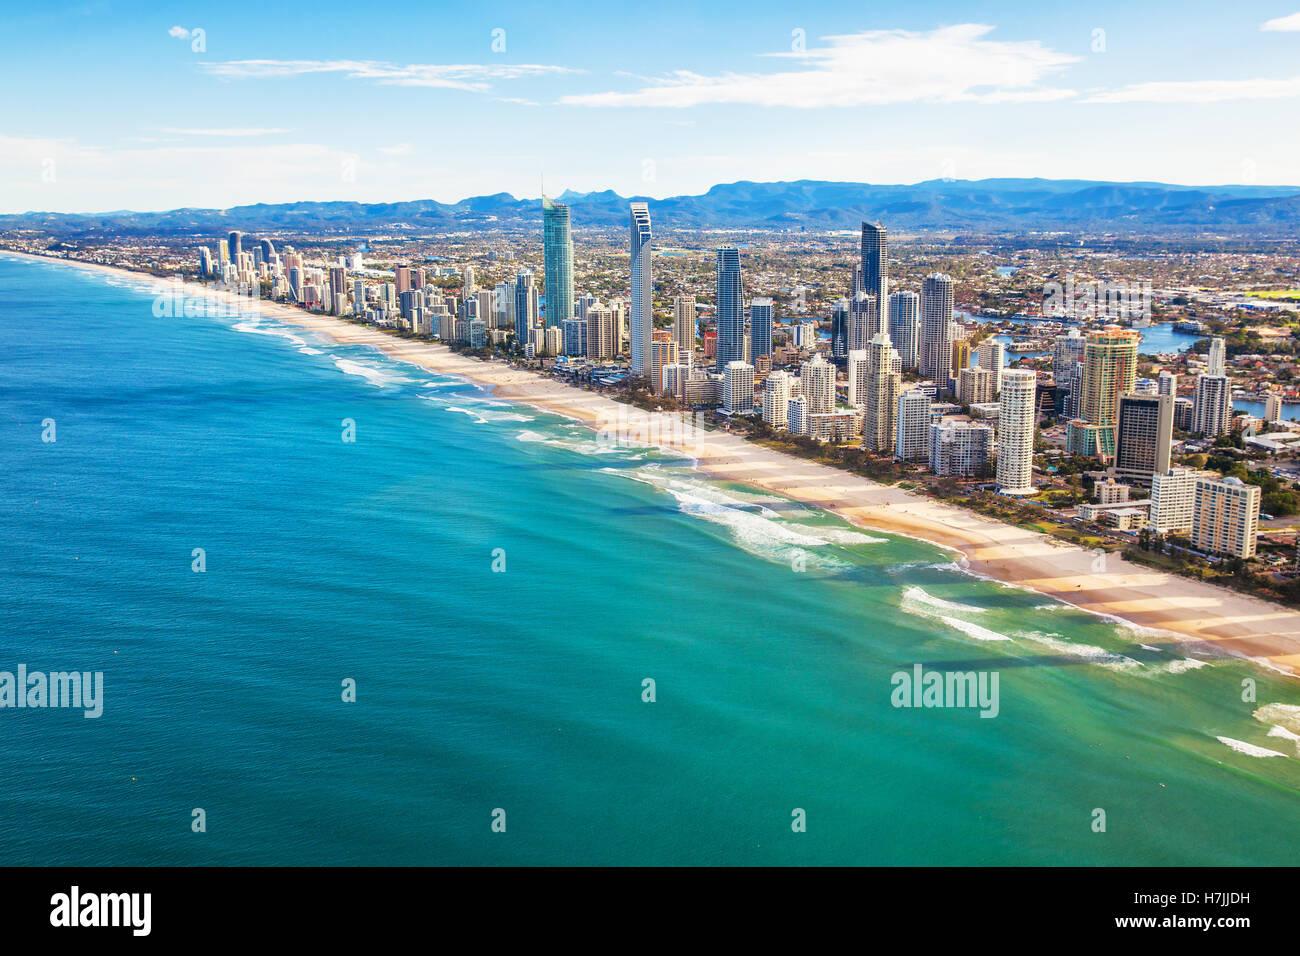 Vista aérea de Surfers Paradise, en la Gold Coast, Queensland, Australia Imagen De Stock